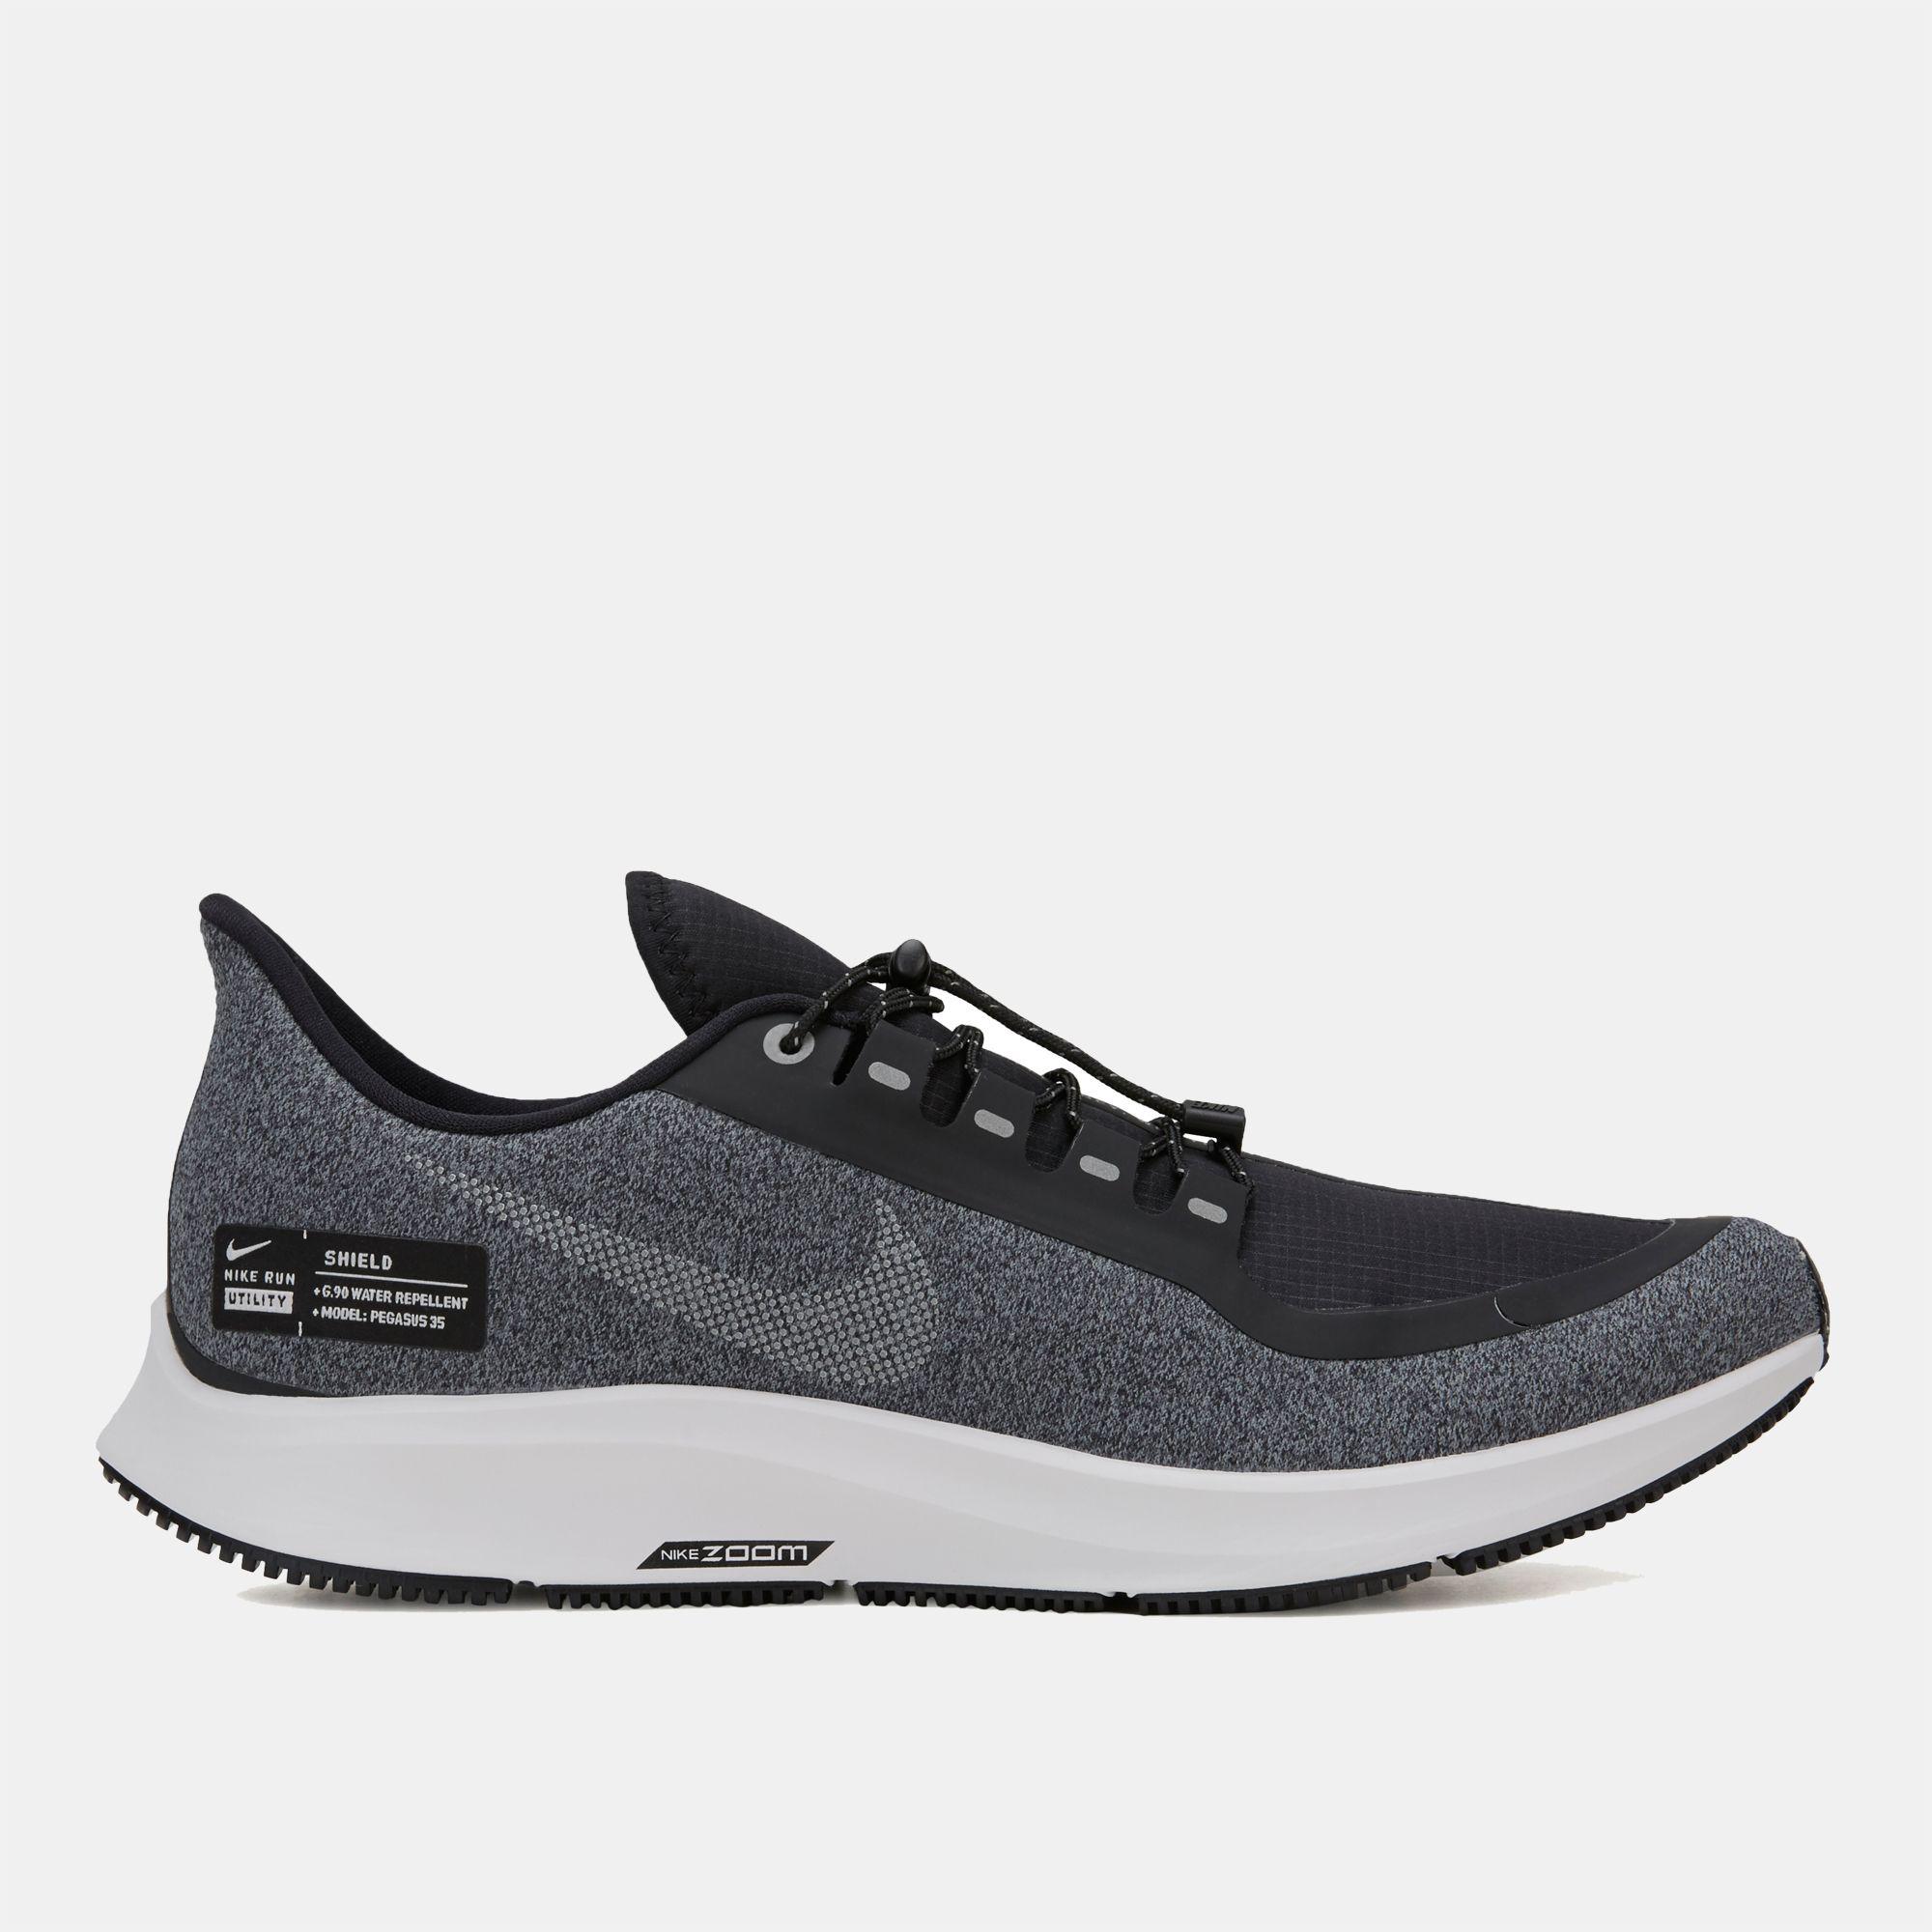 5e1bab1fd9324 Nike Air Zoom Pegasus 35 Shield Shoe | Road Running | Running Shoes ...